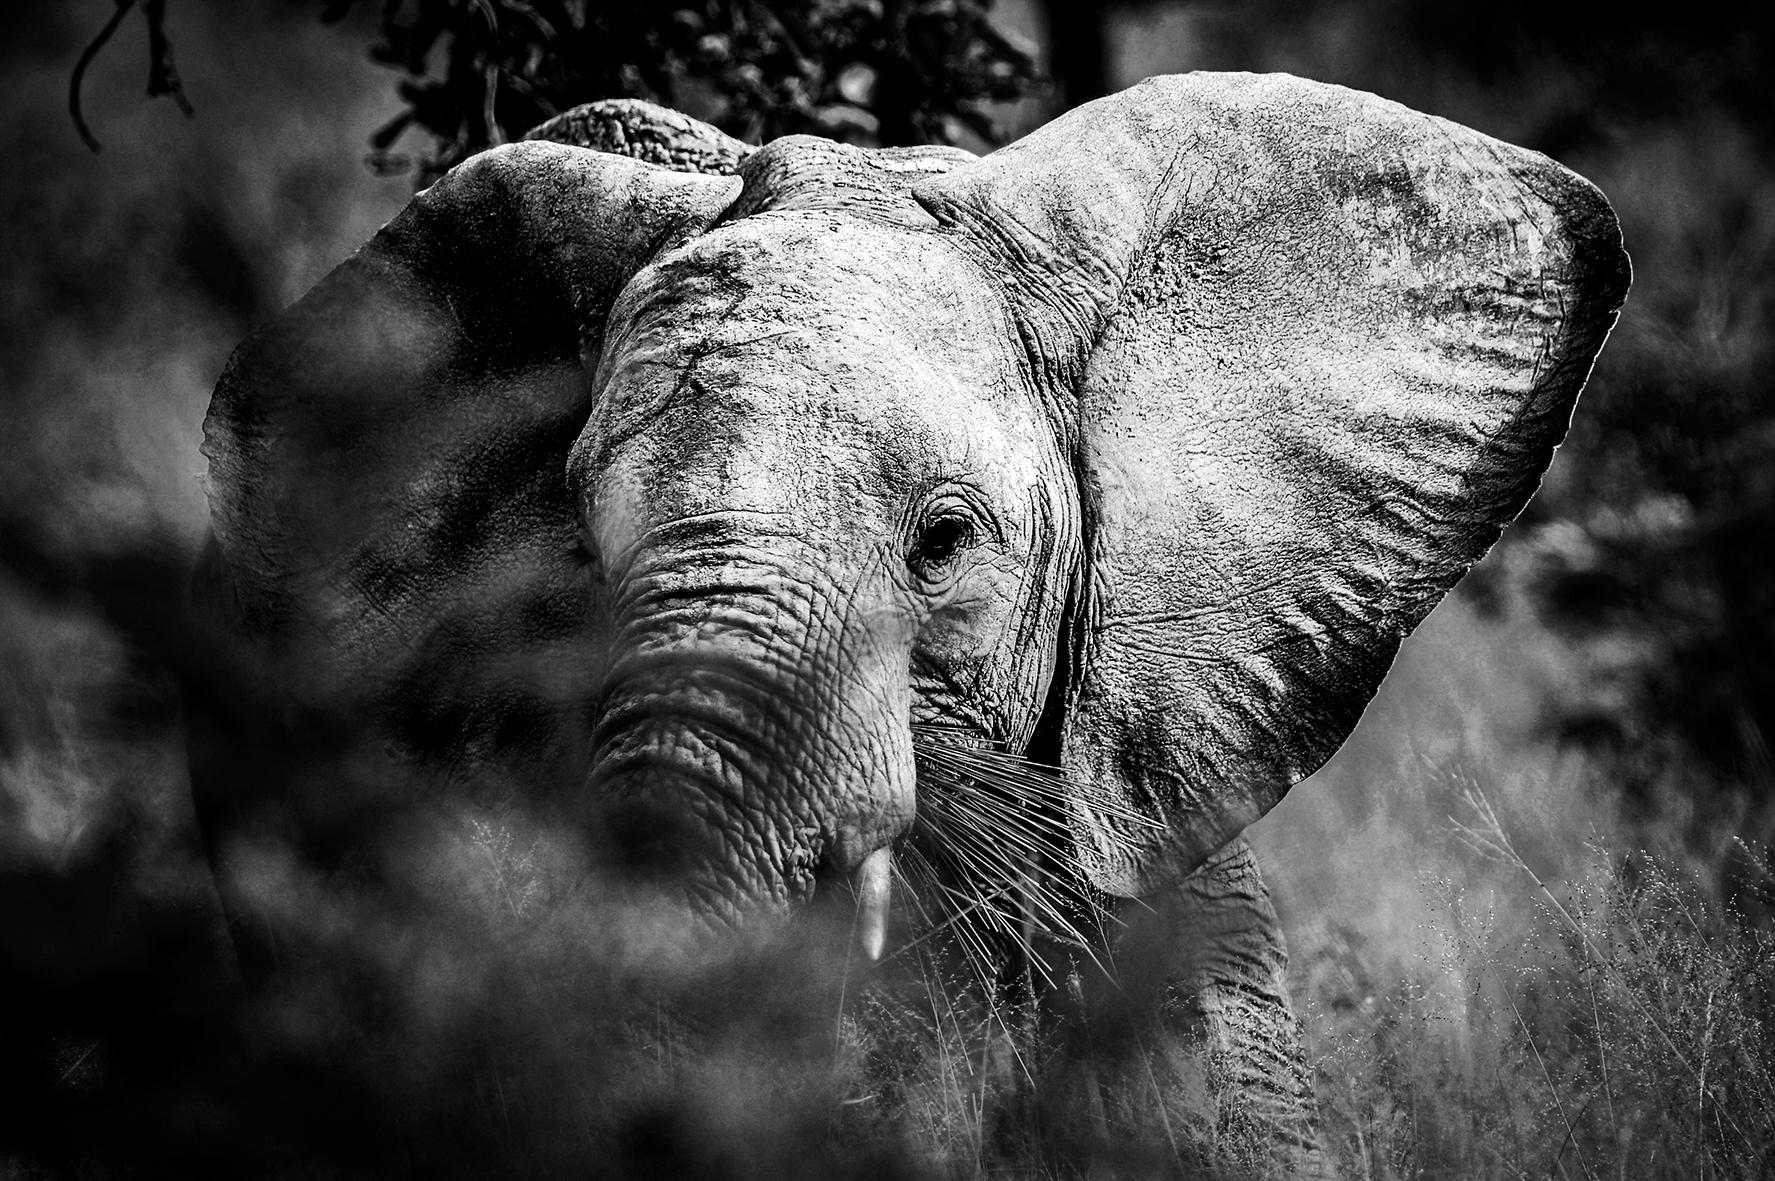 Photographe : wild life n°2